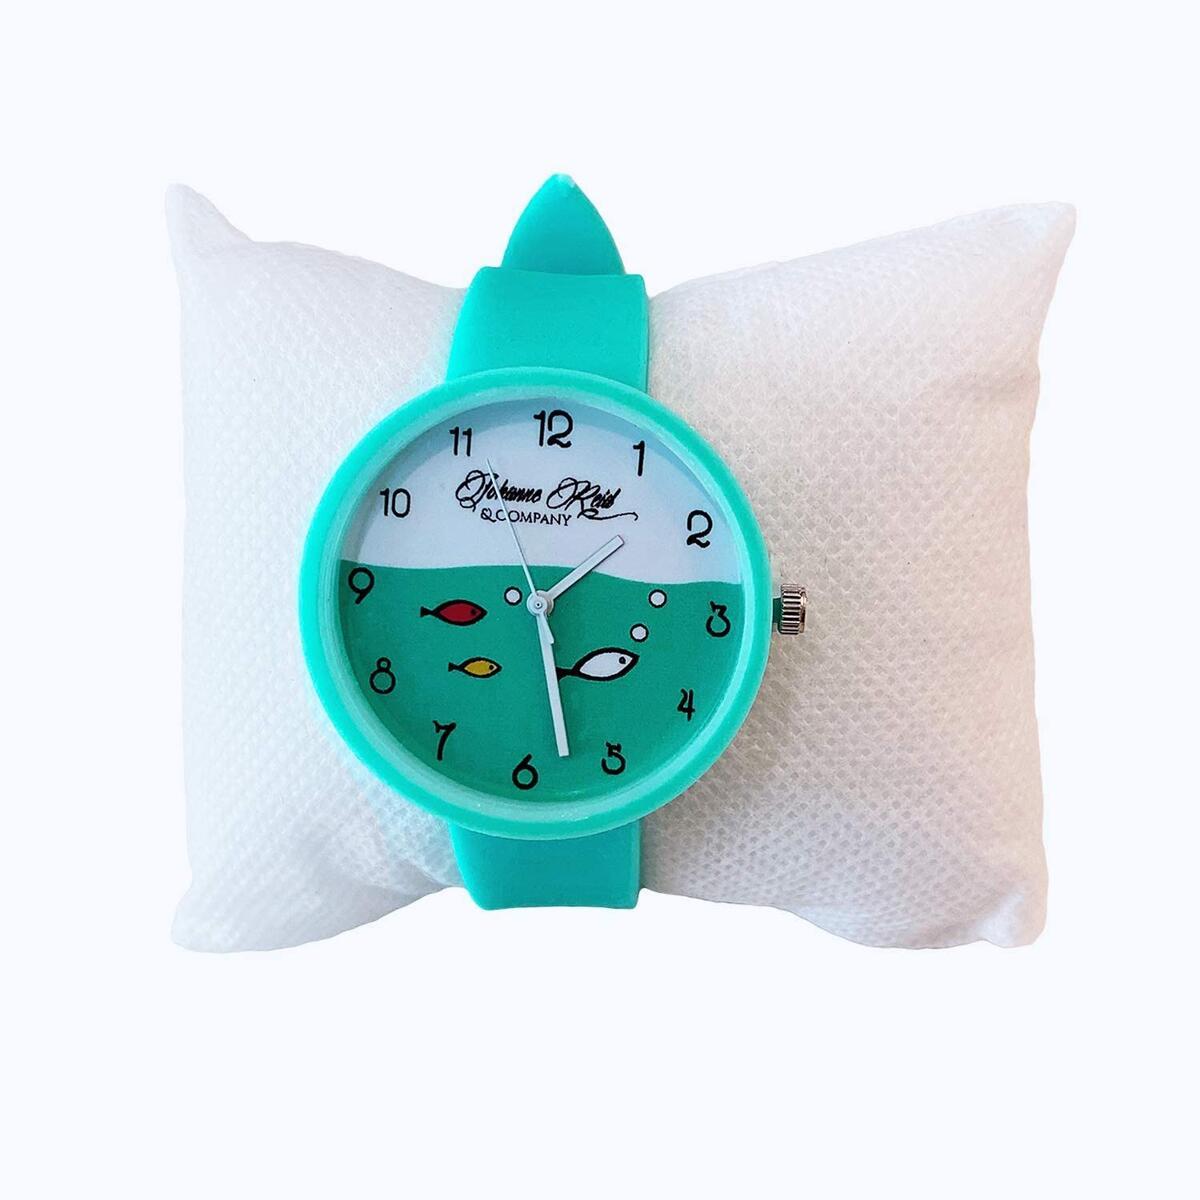 Green & Teal Children's Watch